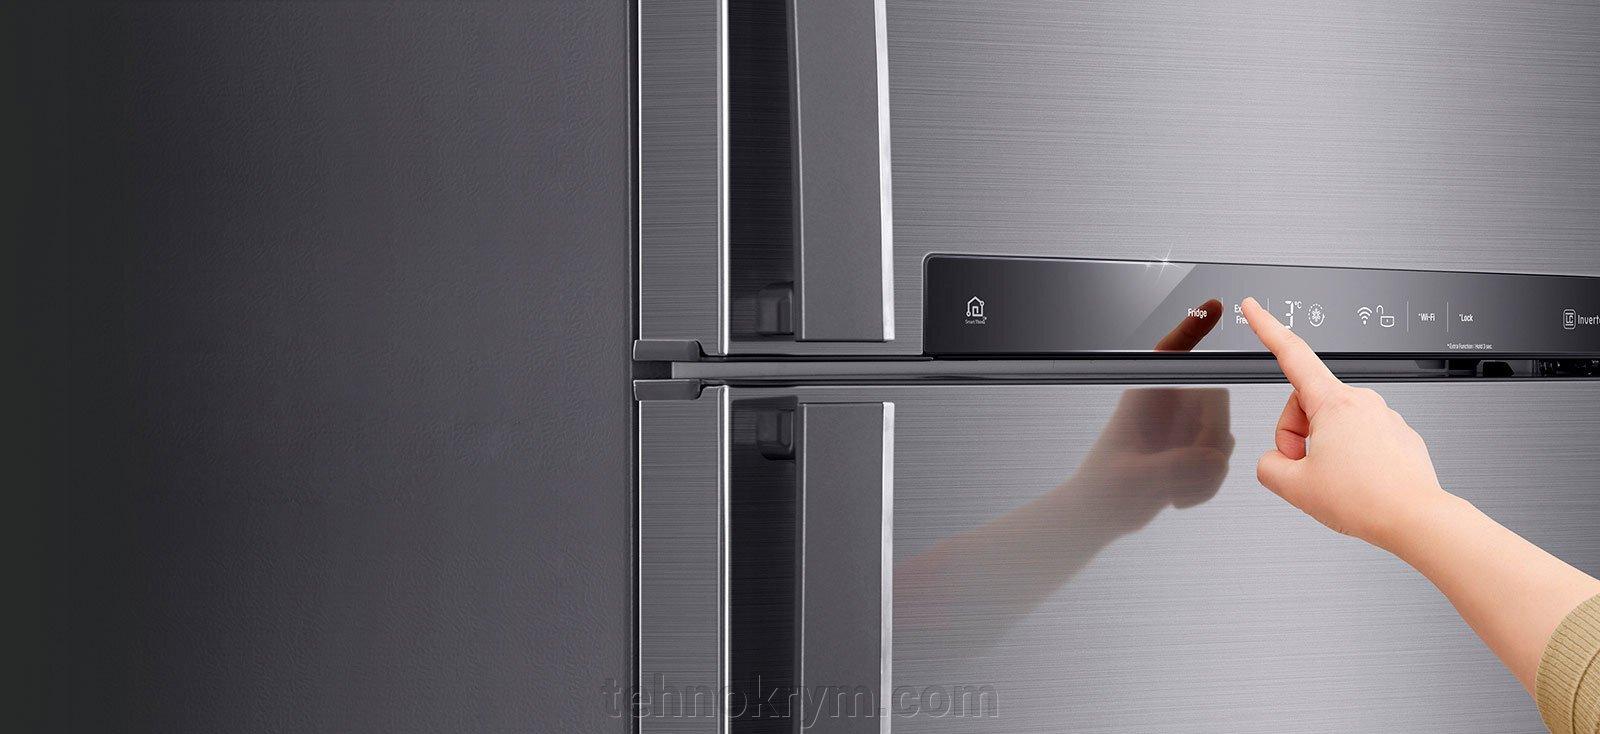 Двухкамерный холодильник LG GC-H502HEHZ, бежевый - фото pic_478e2febcd252c44c7ce11d1314eb73f_1920x9000_1.jpg